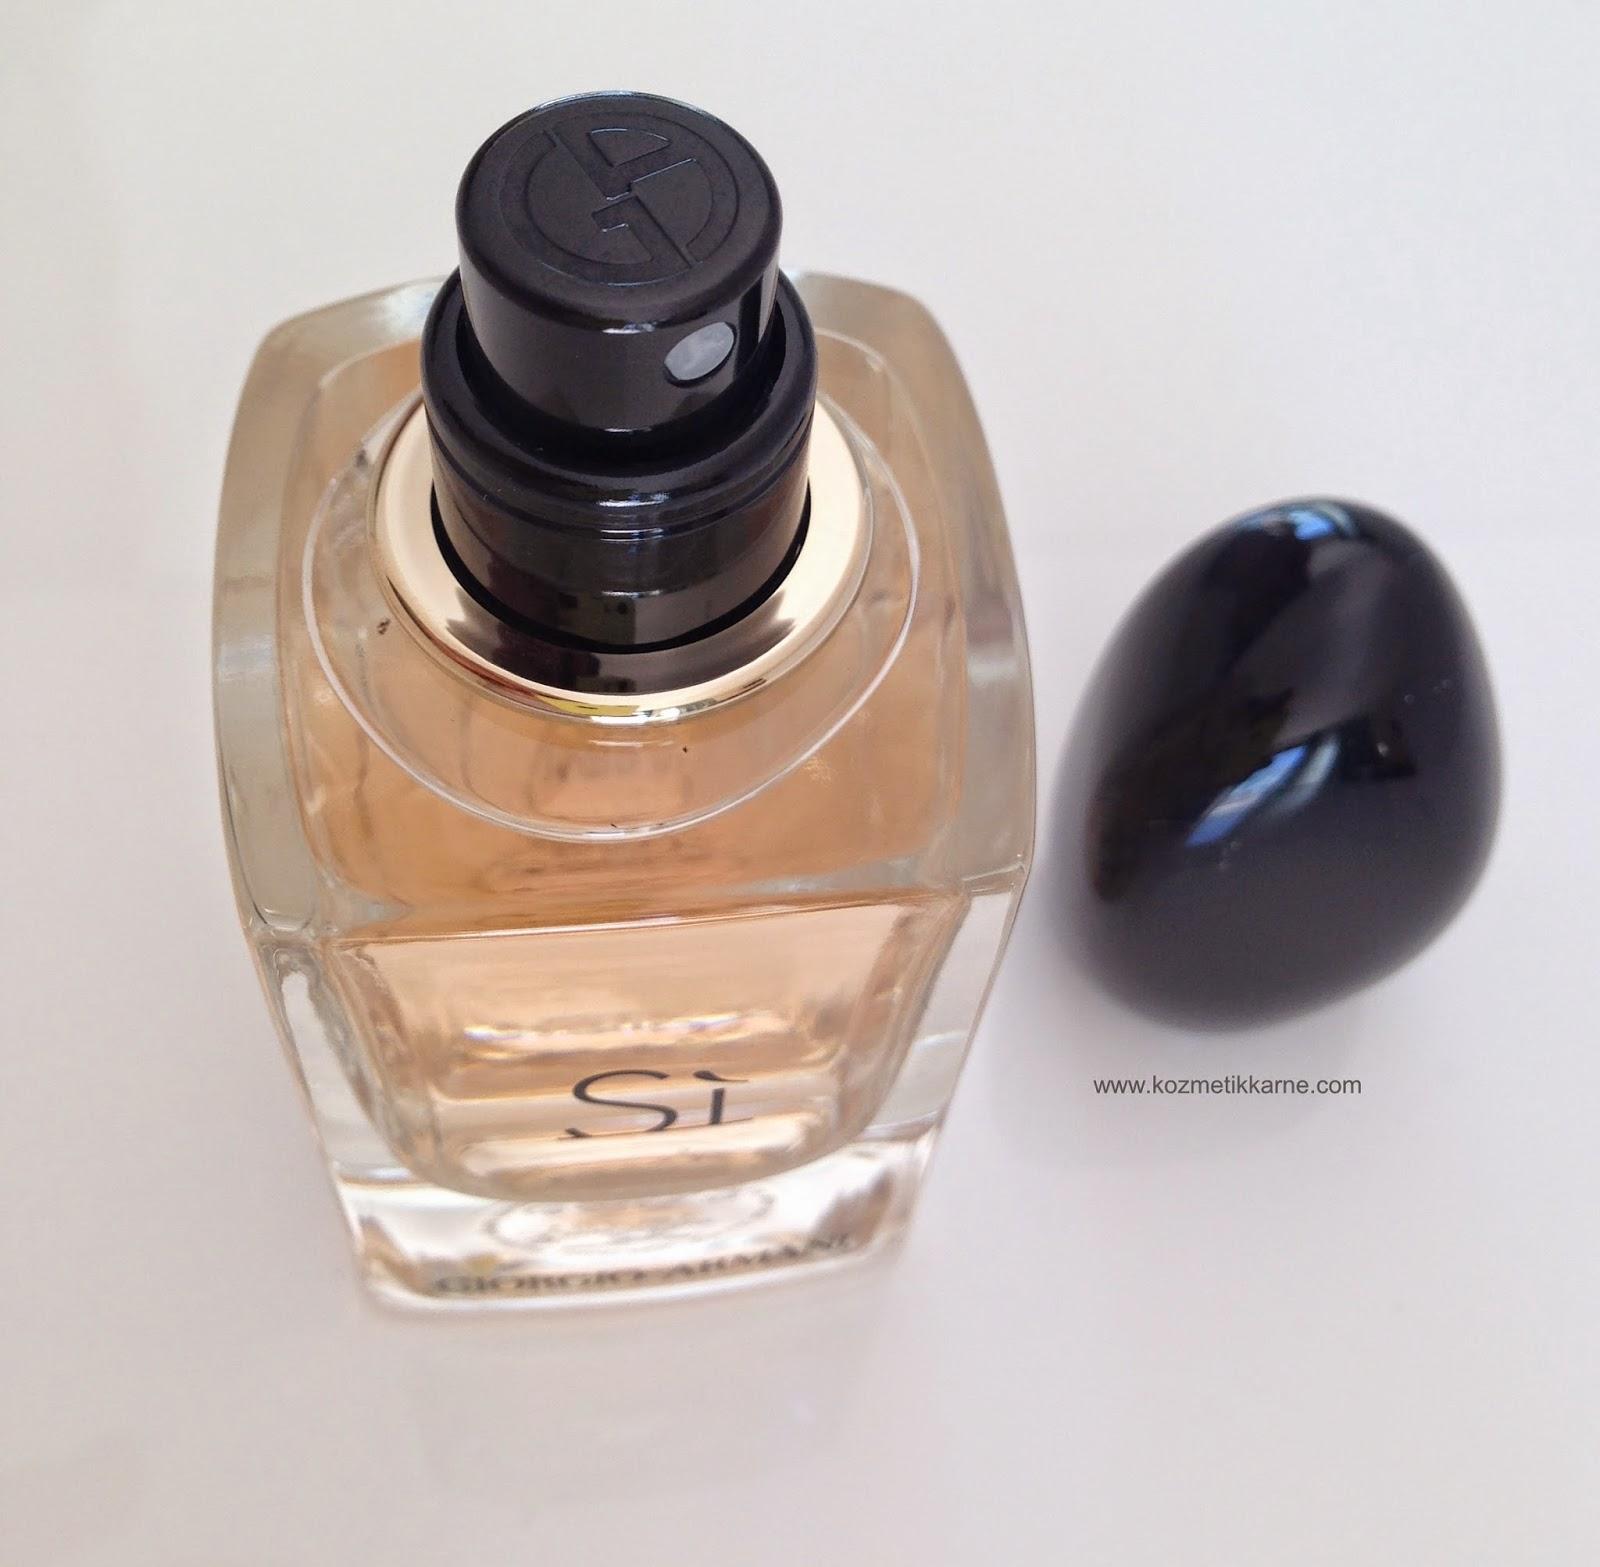 Kozmetikkarne Giorgio Armani Si Edp Kadin Parfüm